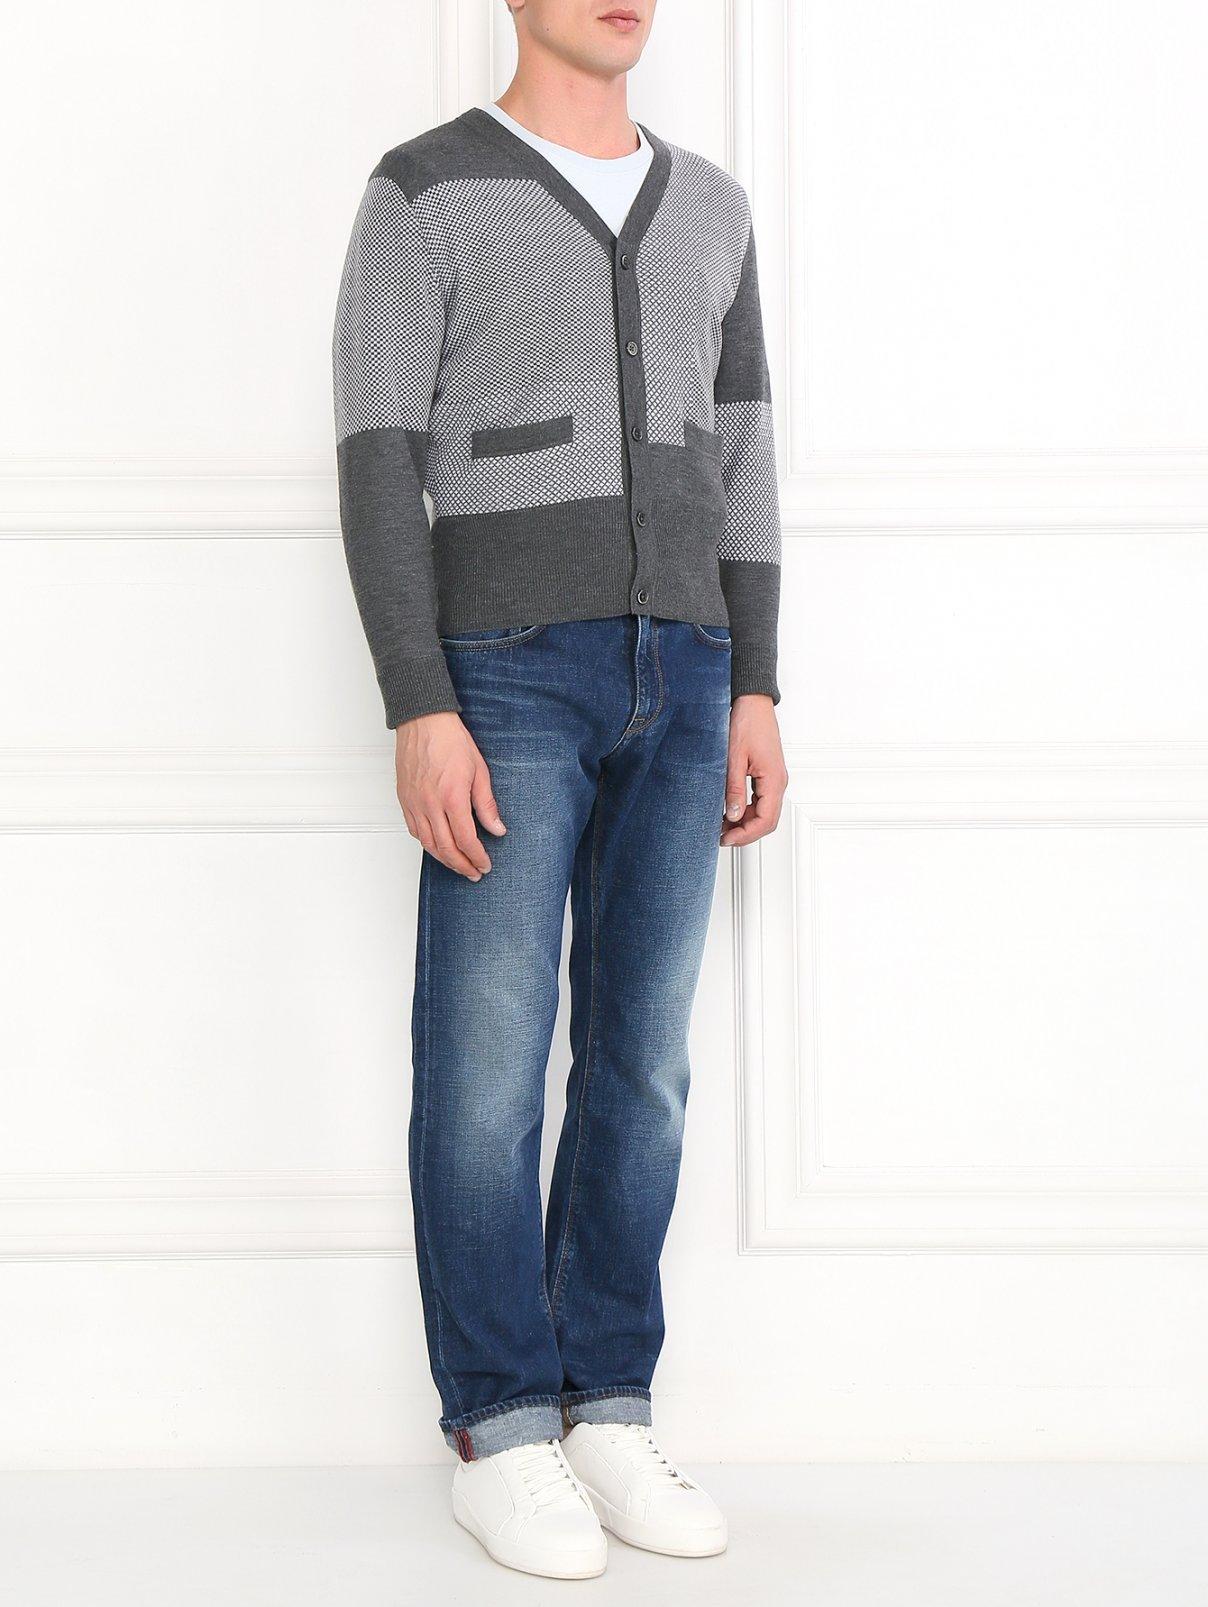 Кардиган из шерсти с узором Brooks Brothers  –  Модель Общий вид  – Цвет:  Серый